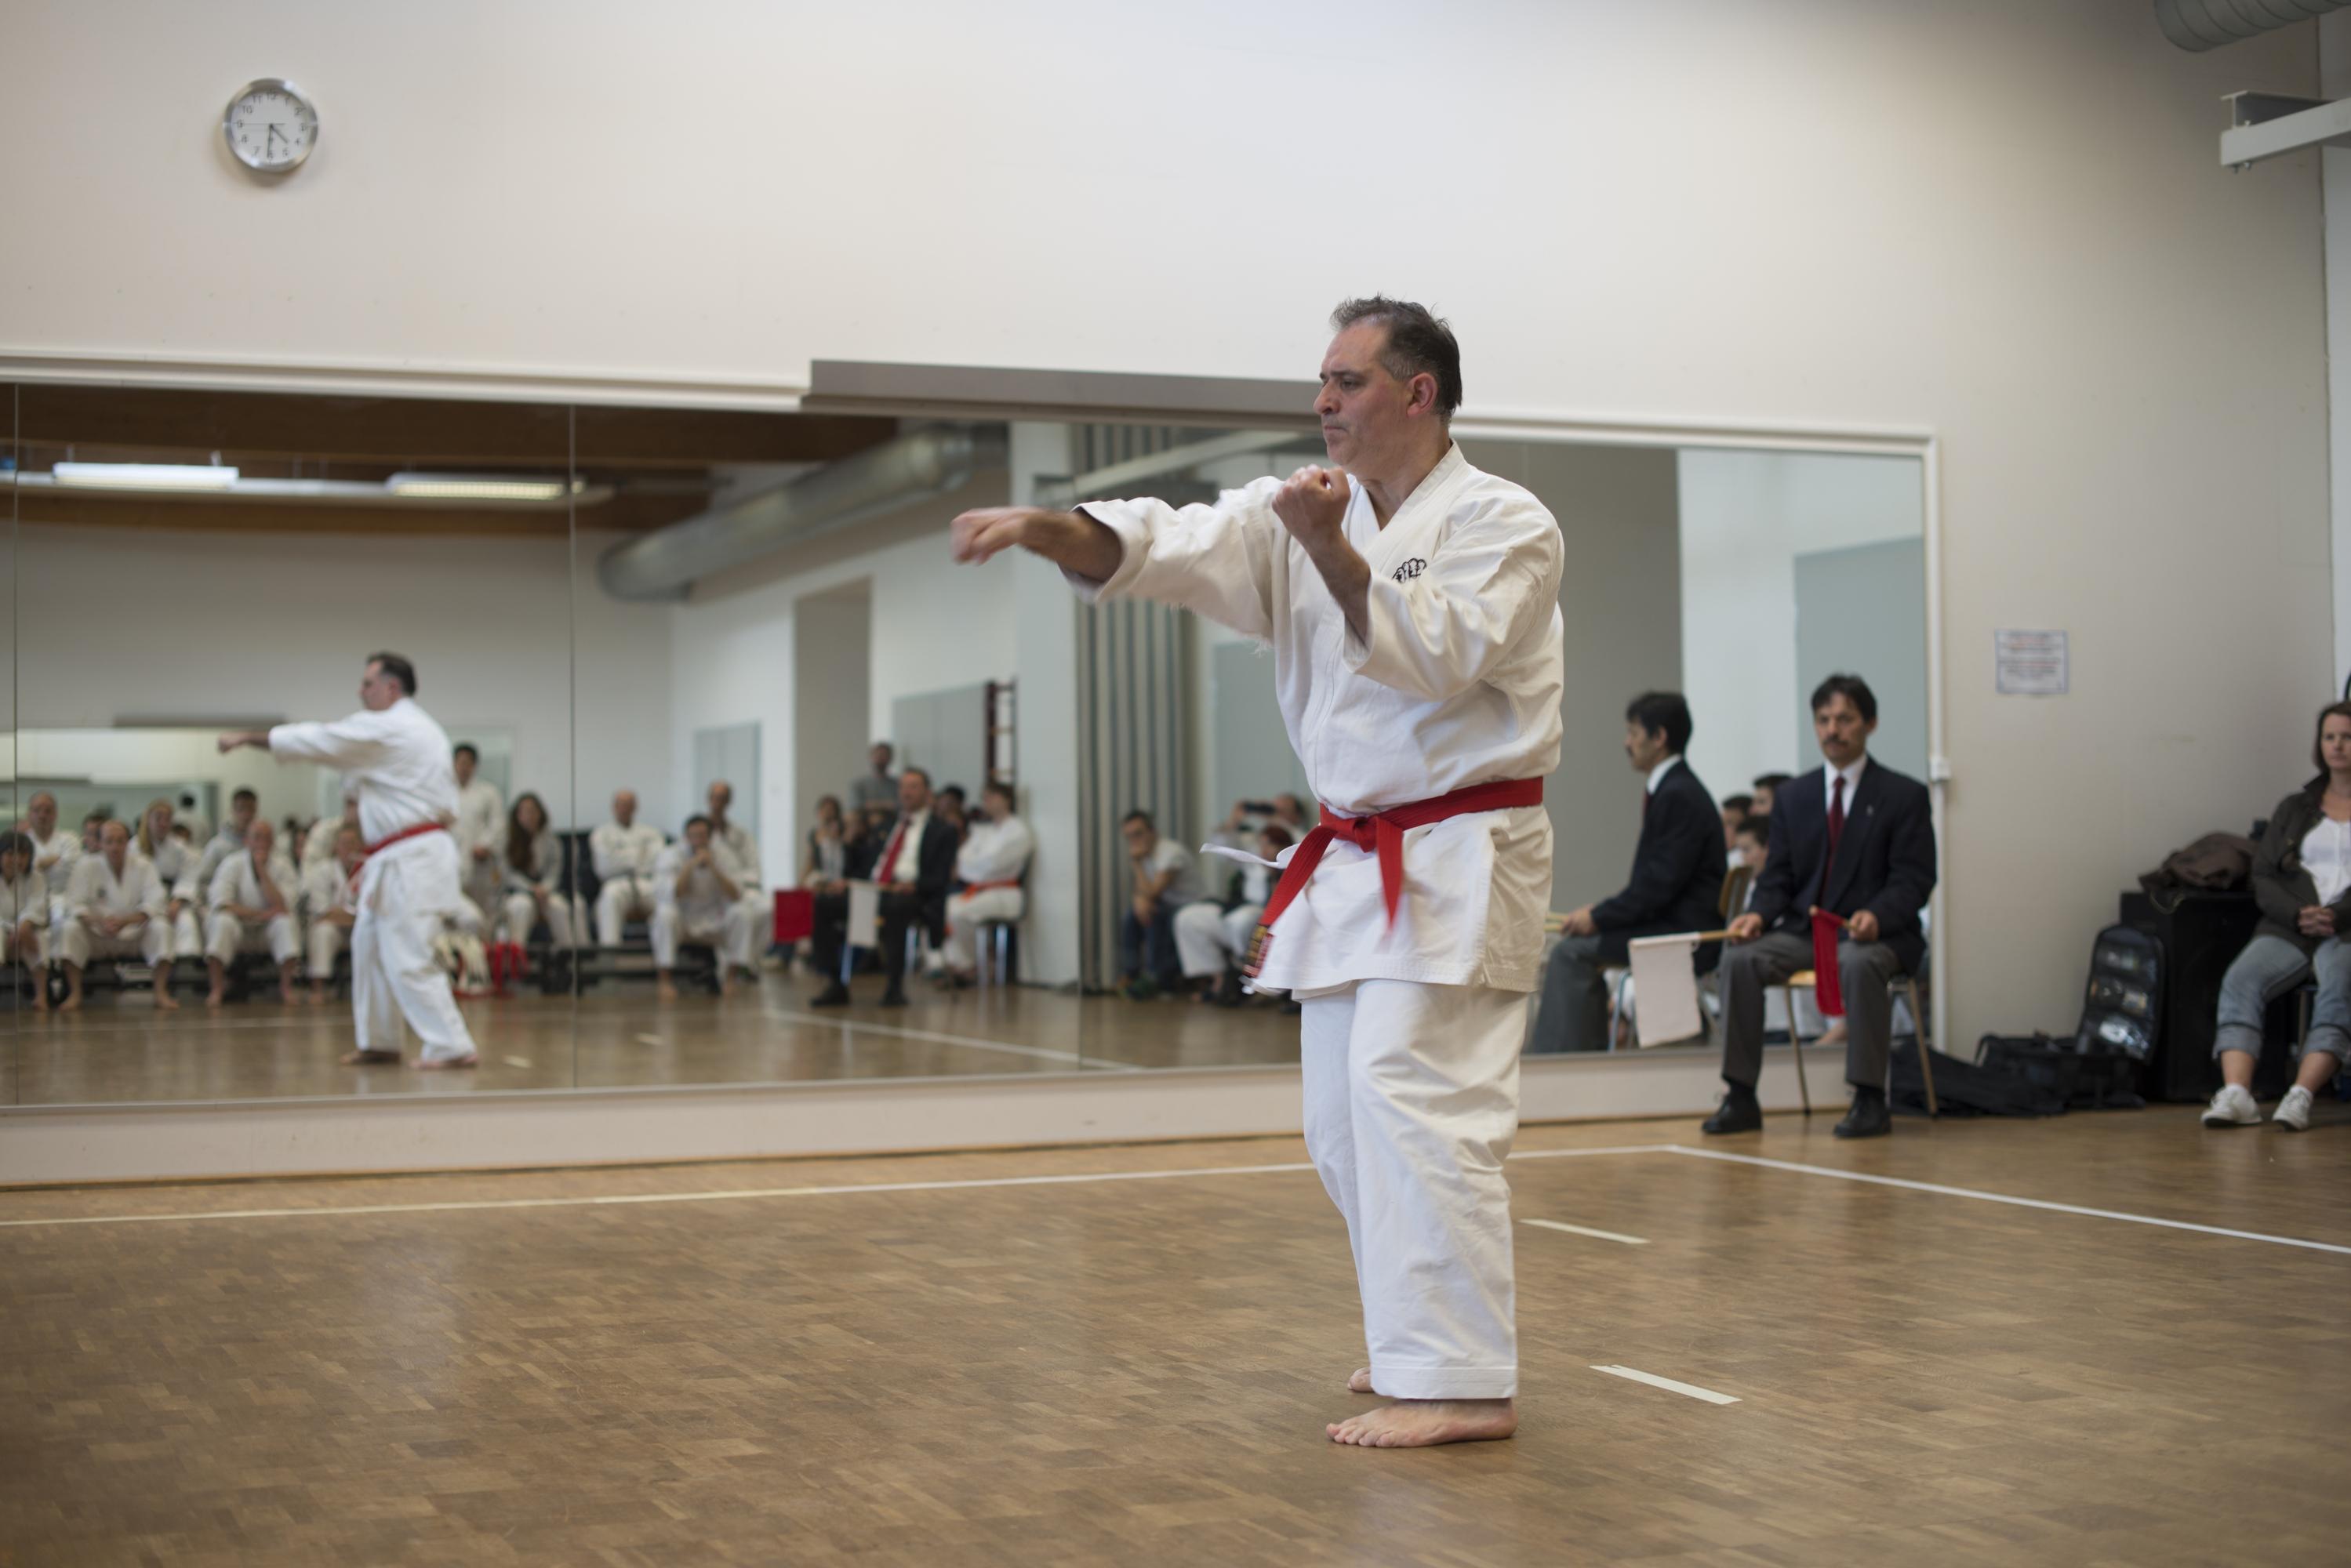 2016-04-26 Kata Turnier Kaarst 298